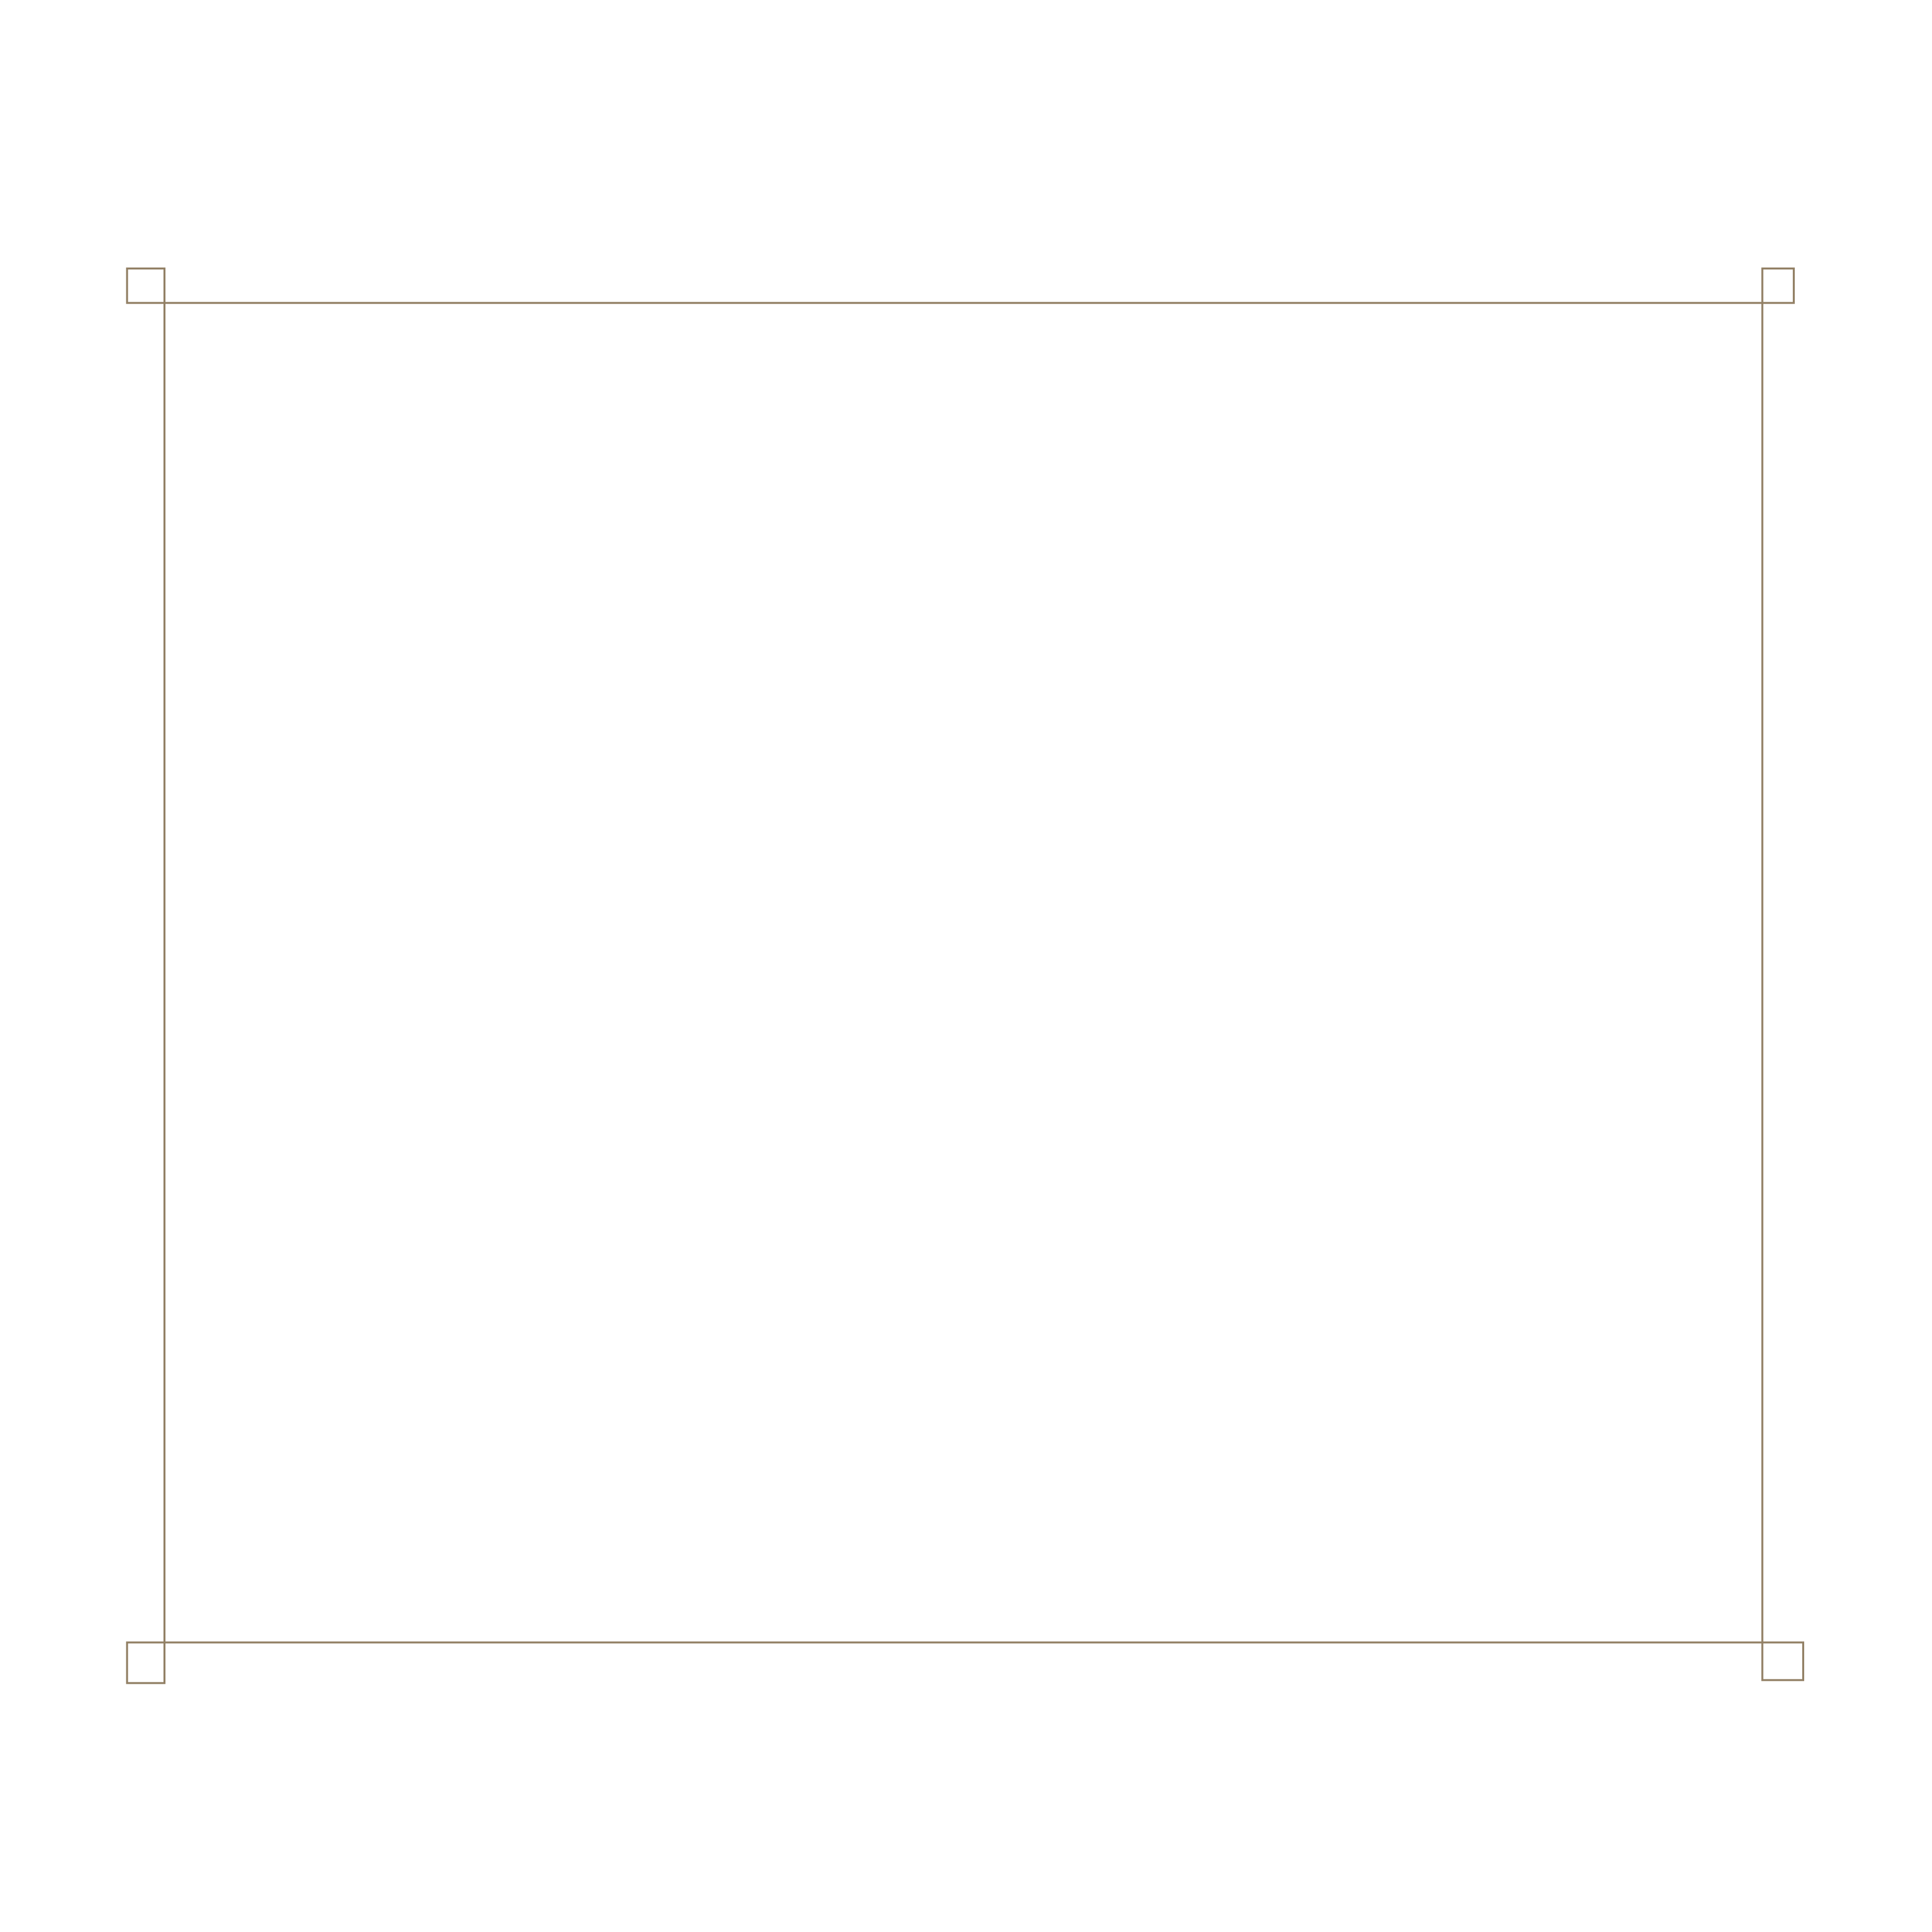 Png Frame White Frame Border Design Free Photo Frames Free Picture Frames